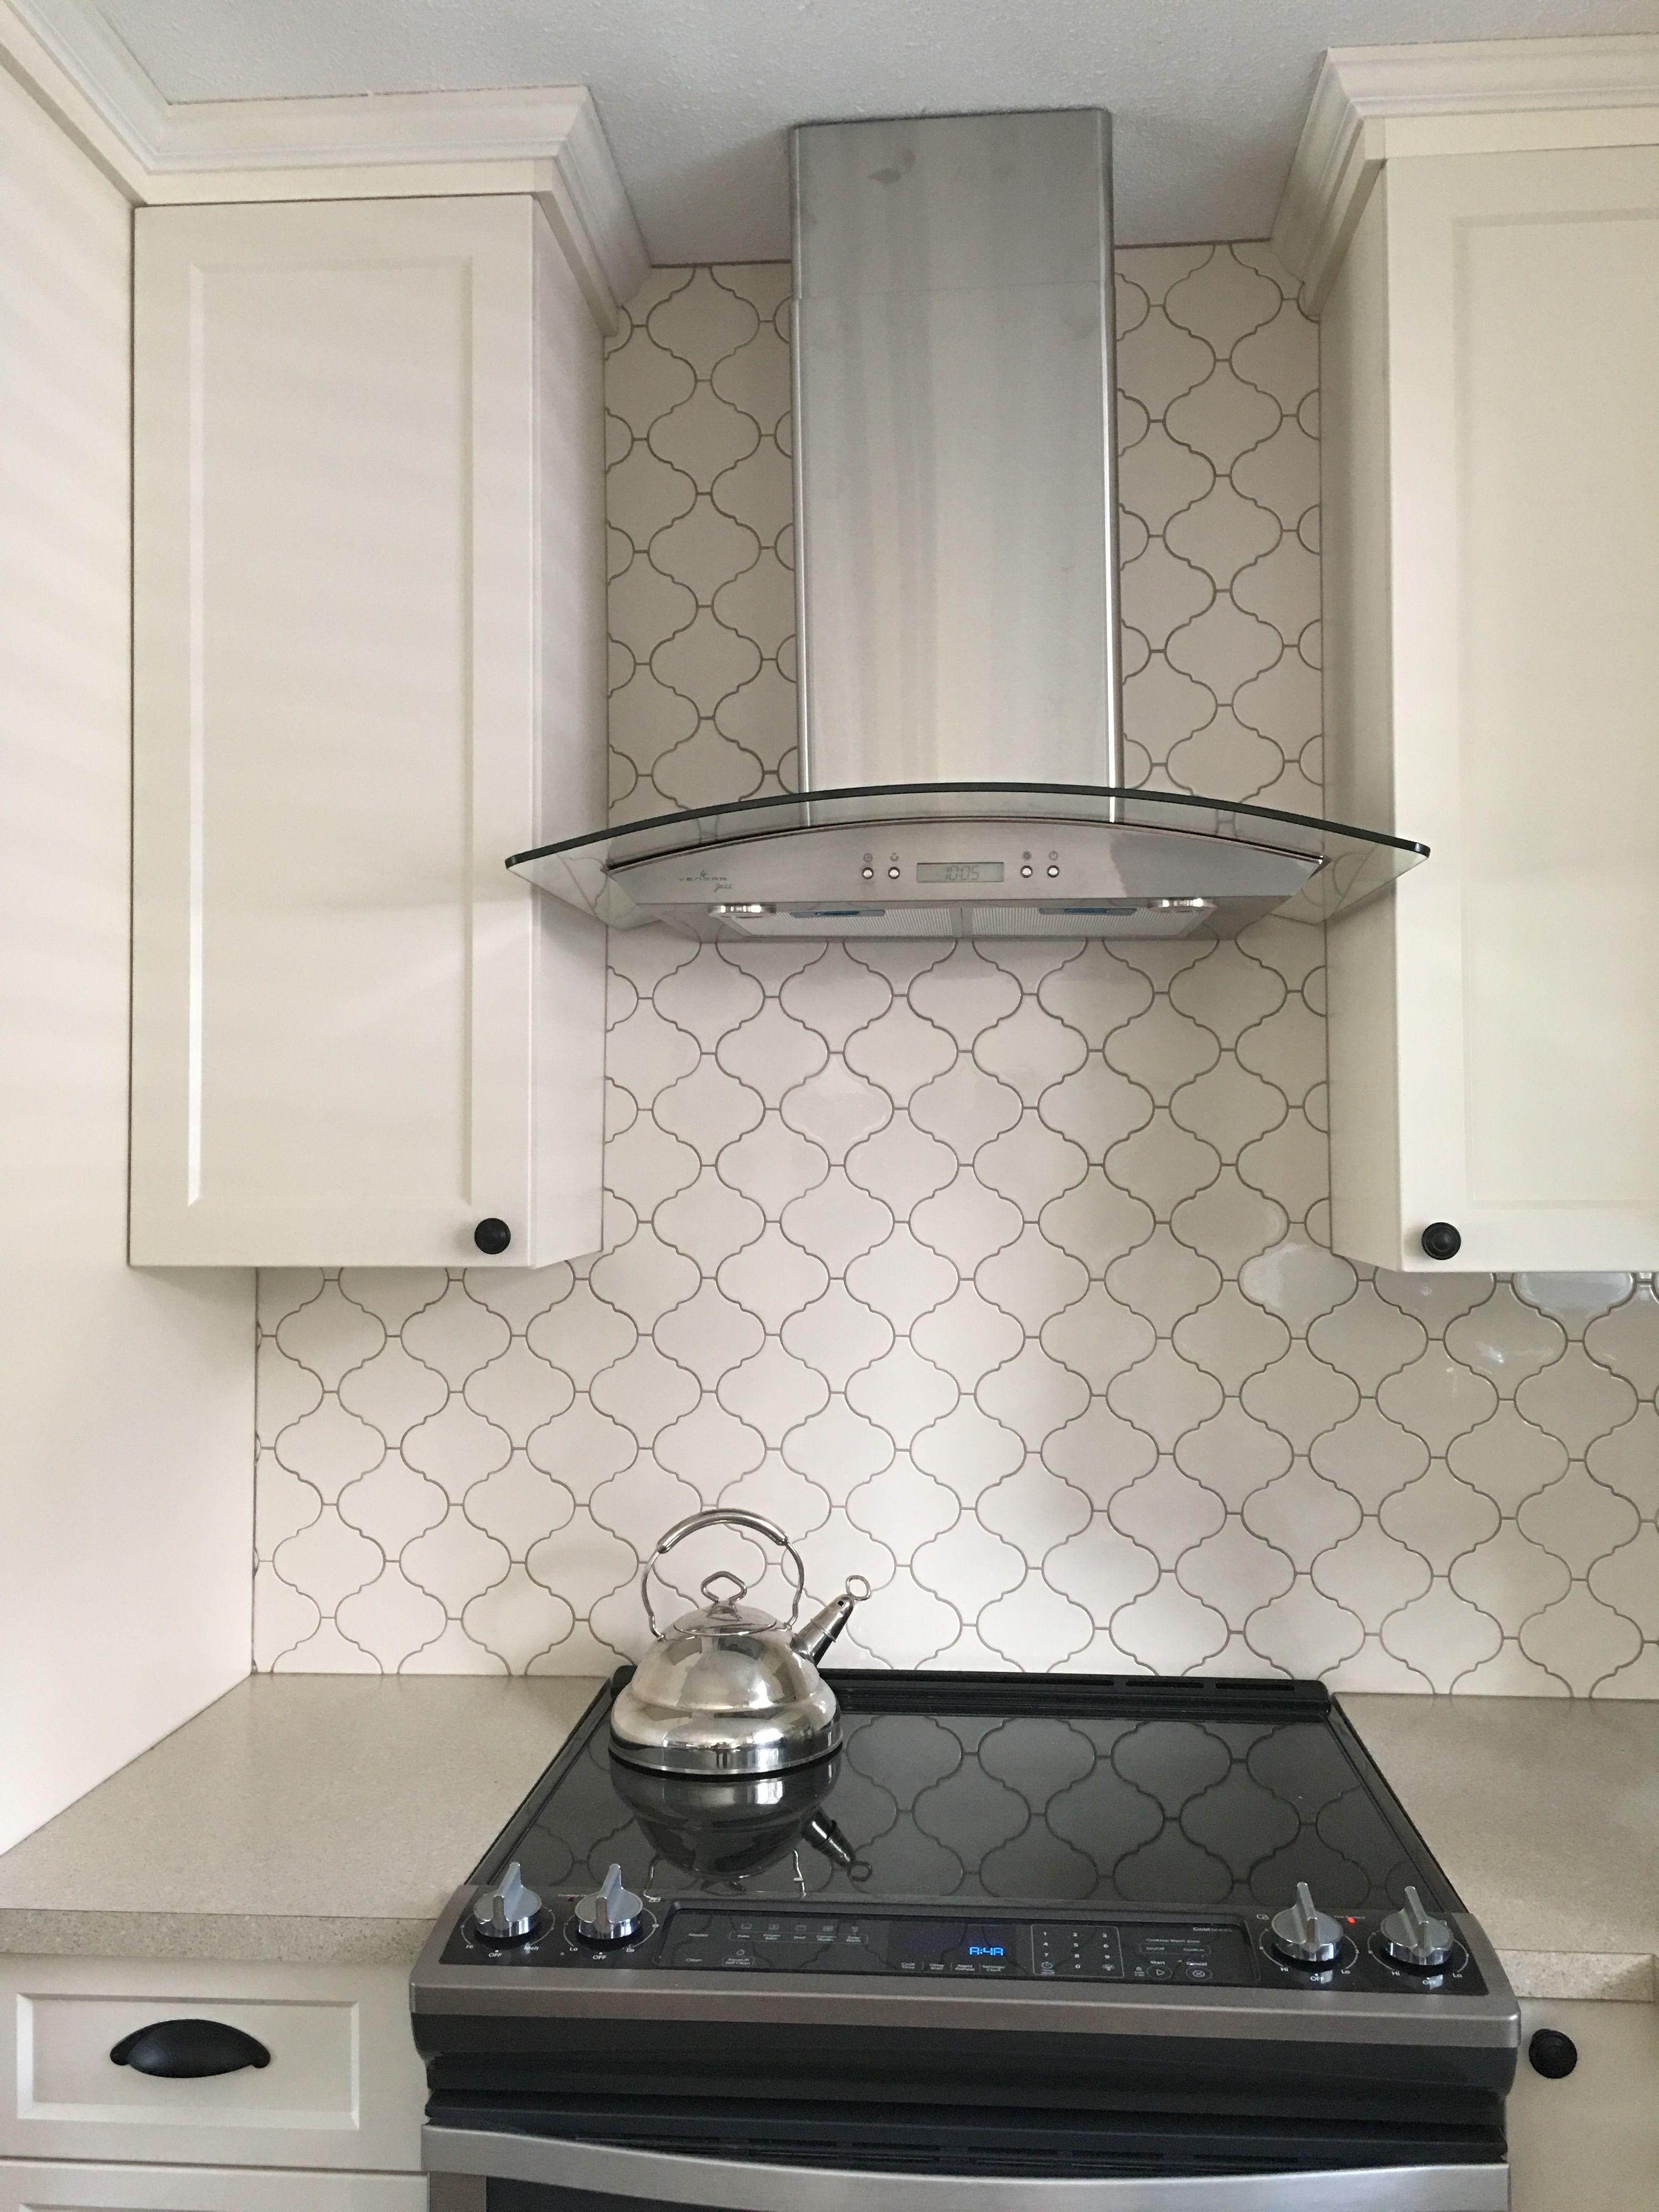 Kitchen Love Arabesque Tile Back Splash Cream Shaker Cabinet Black Hardware Interior Design Kitchen Arabesque Tile Kitchen Renovation